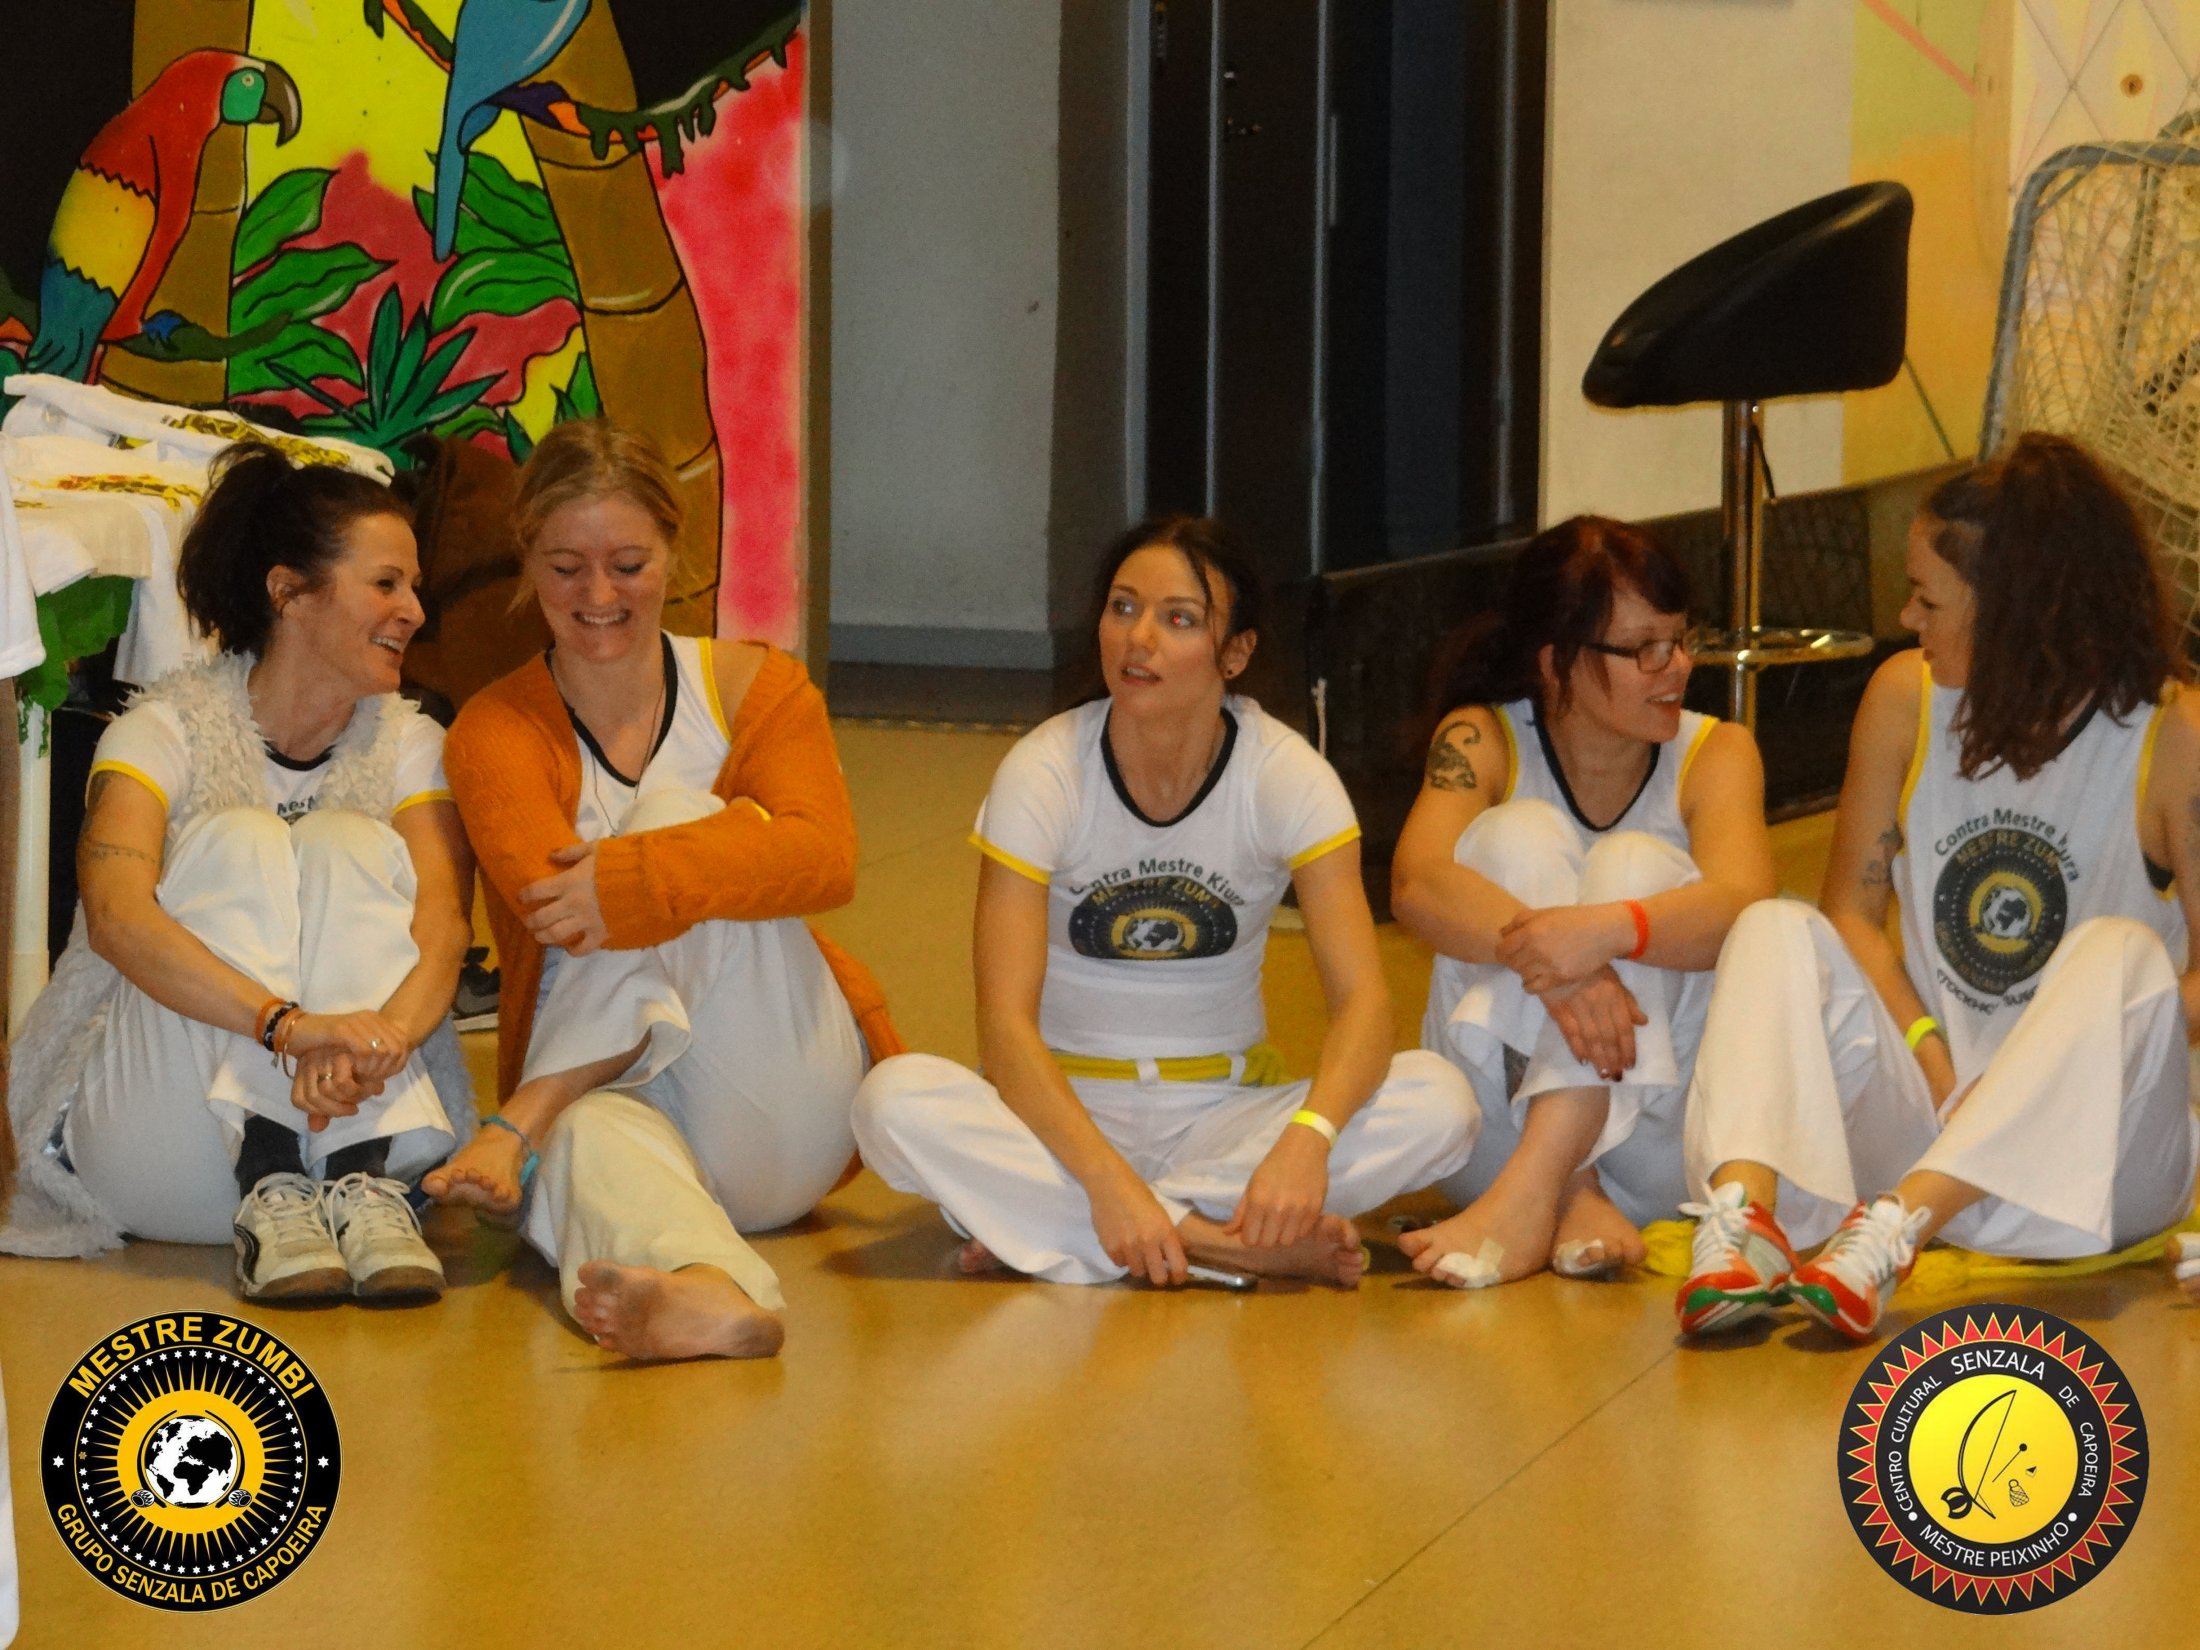 2013-12-14 - Capoeira 025